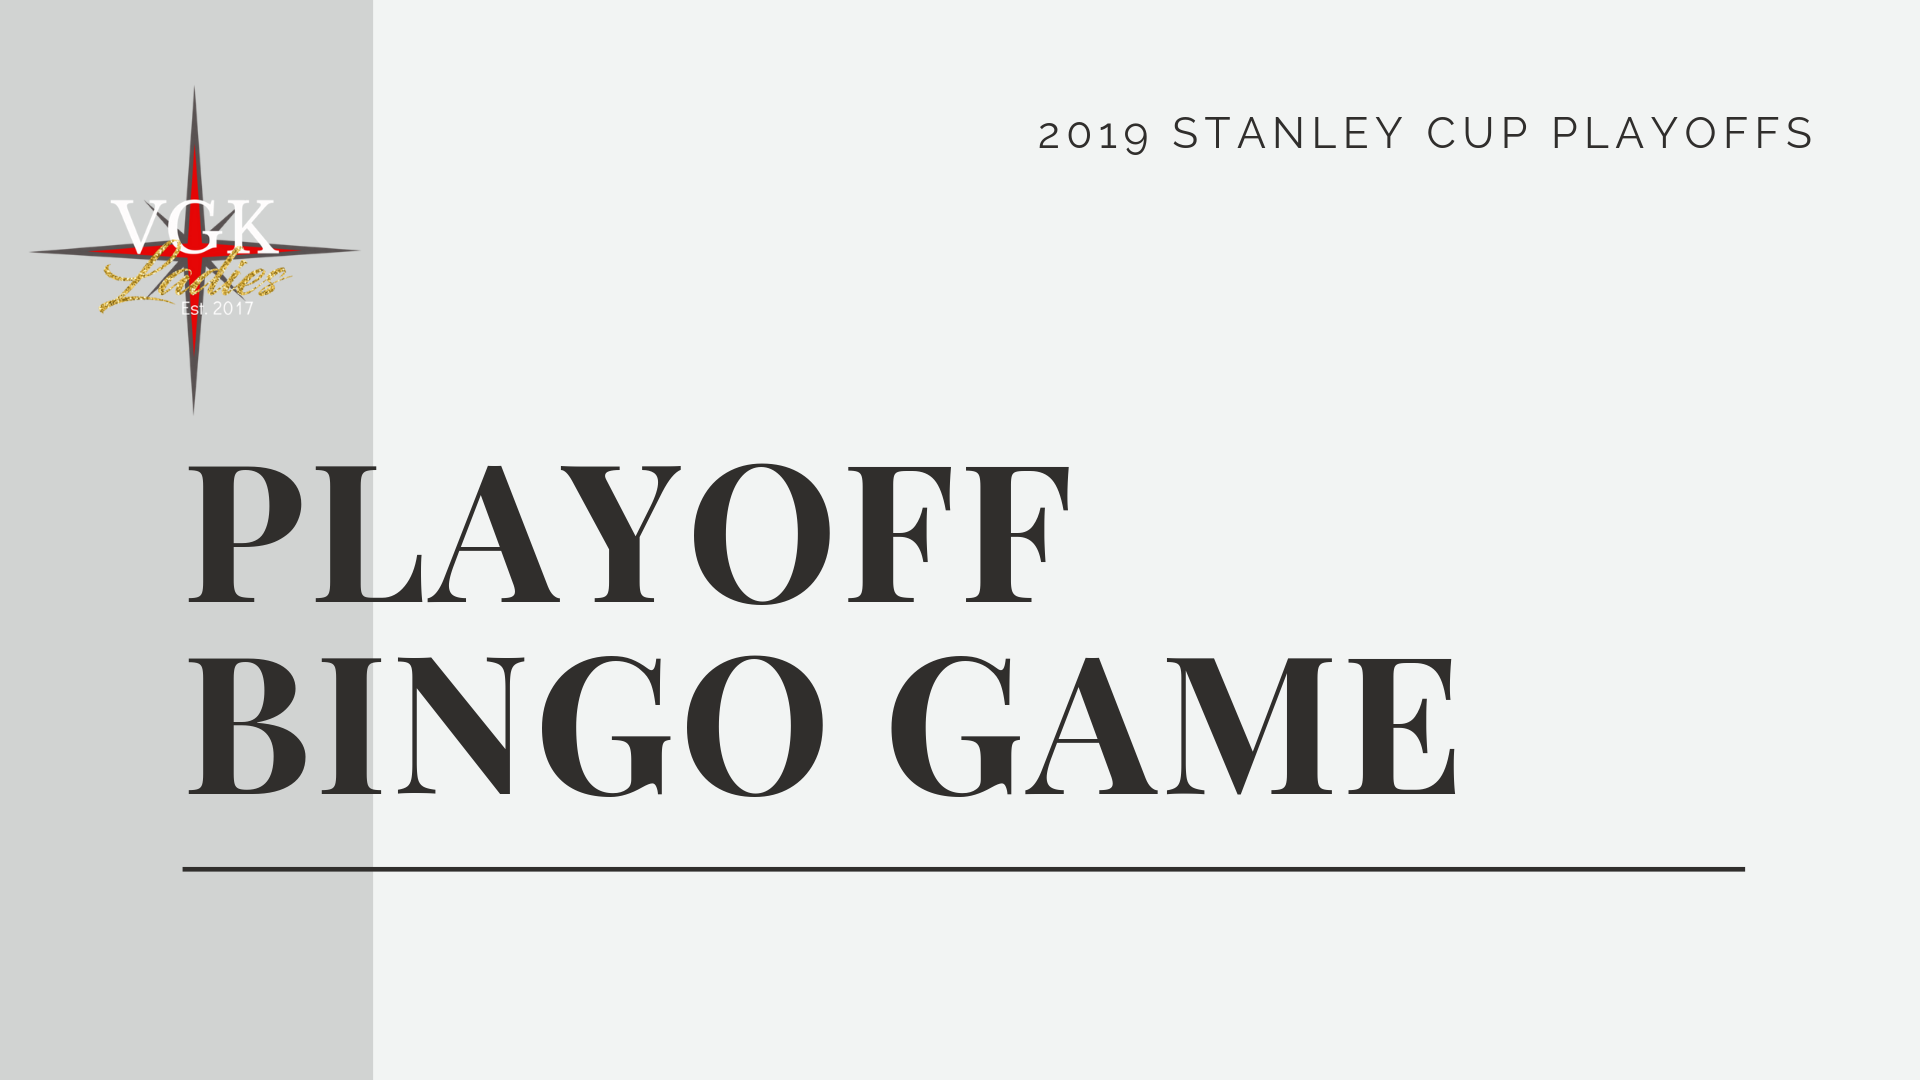 Playoff Bingo Game - VGK Ladies